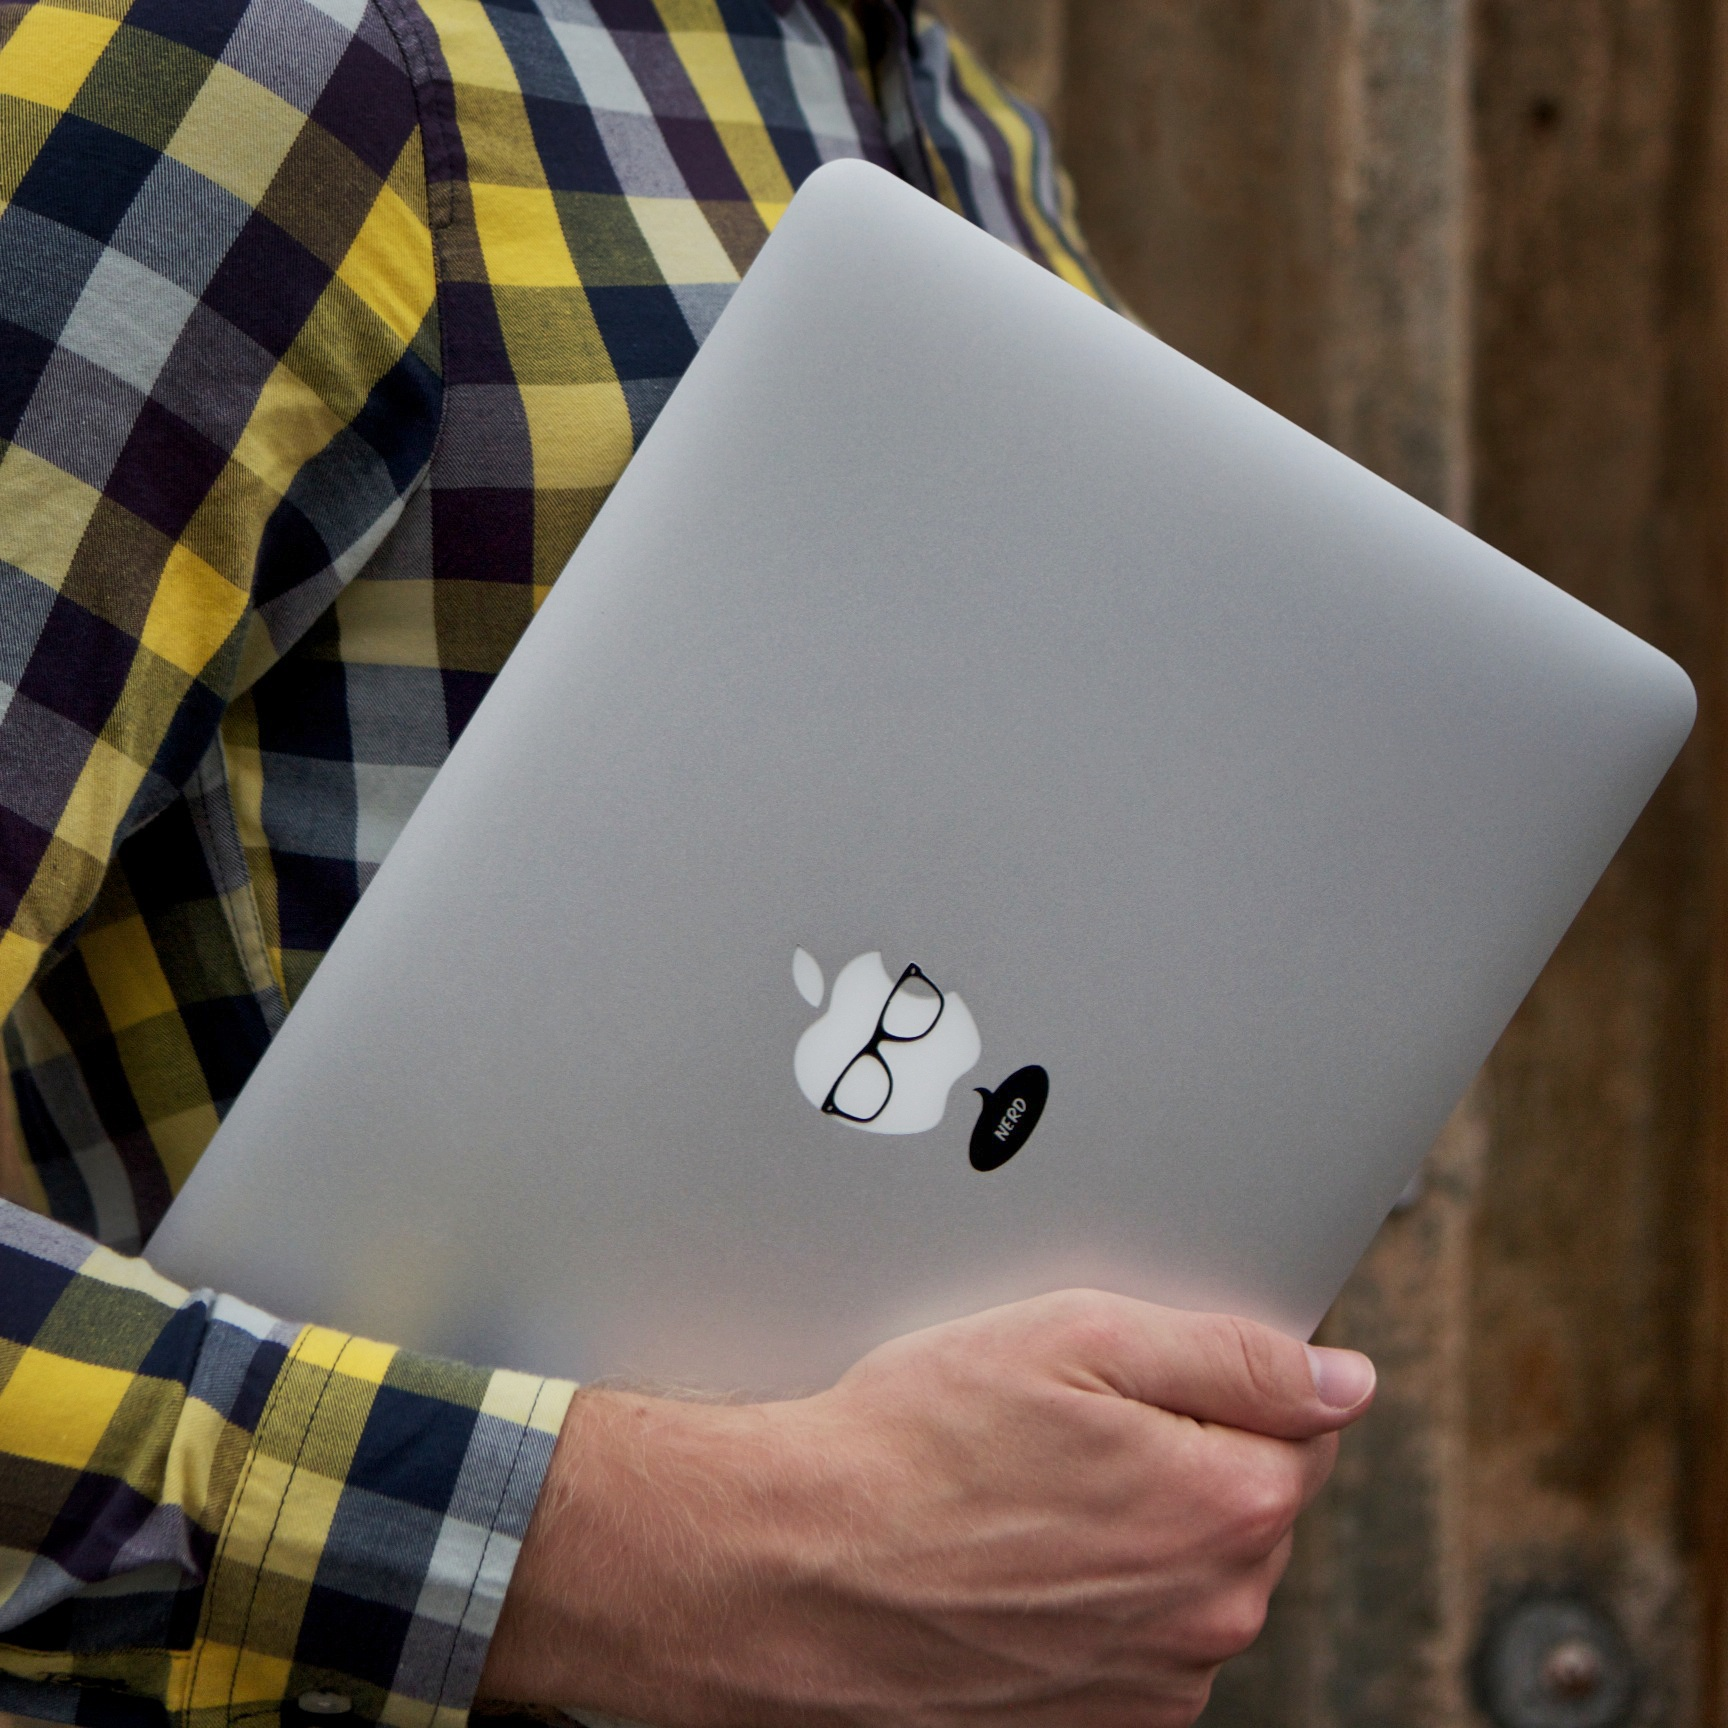 Nerd Macbook Decal By Macstickrs